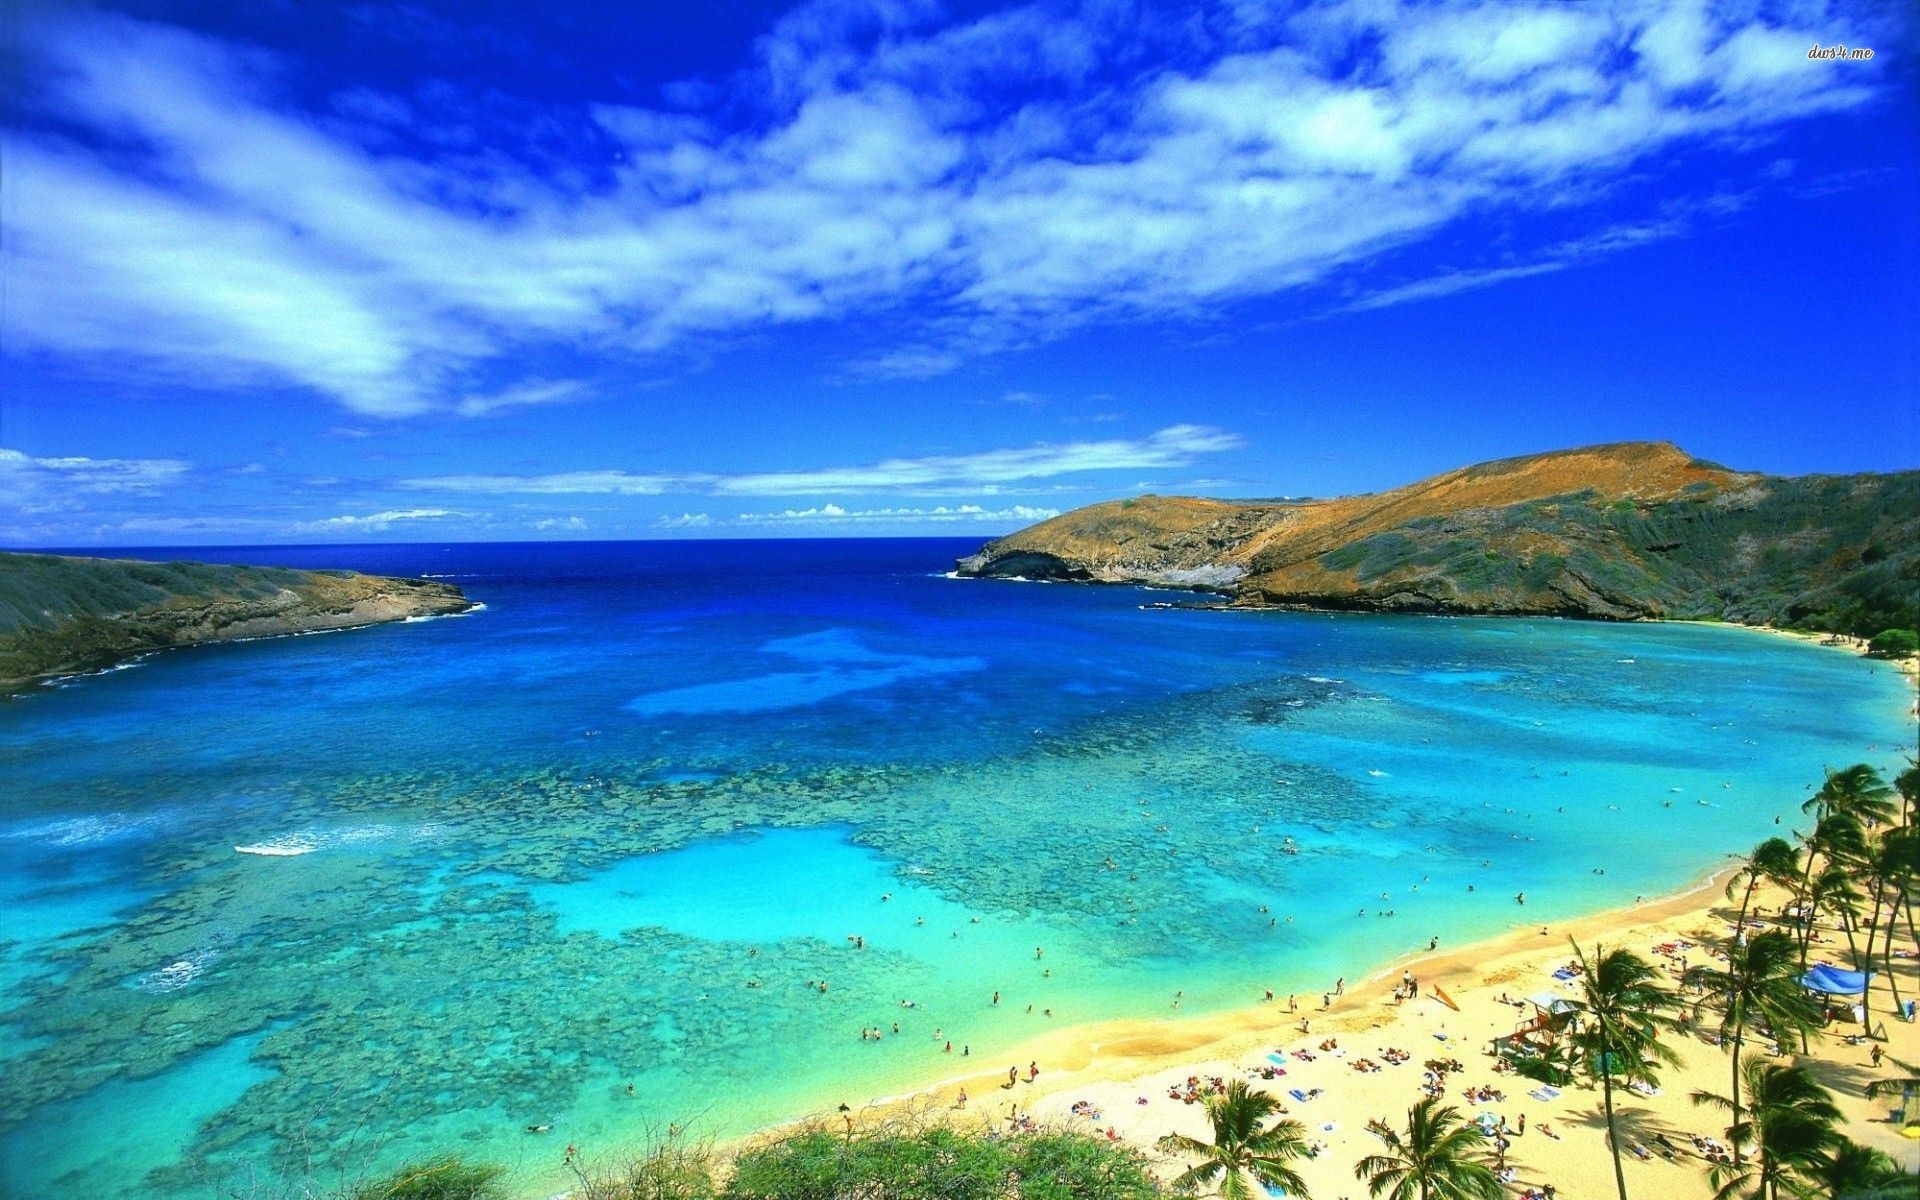 hawaii beaches wallpaper - wallpapersafari